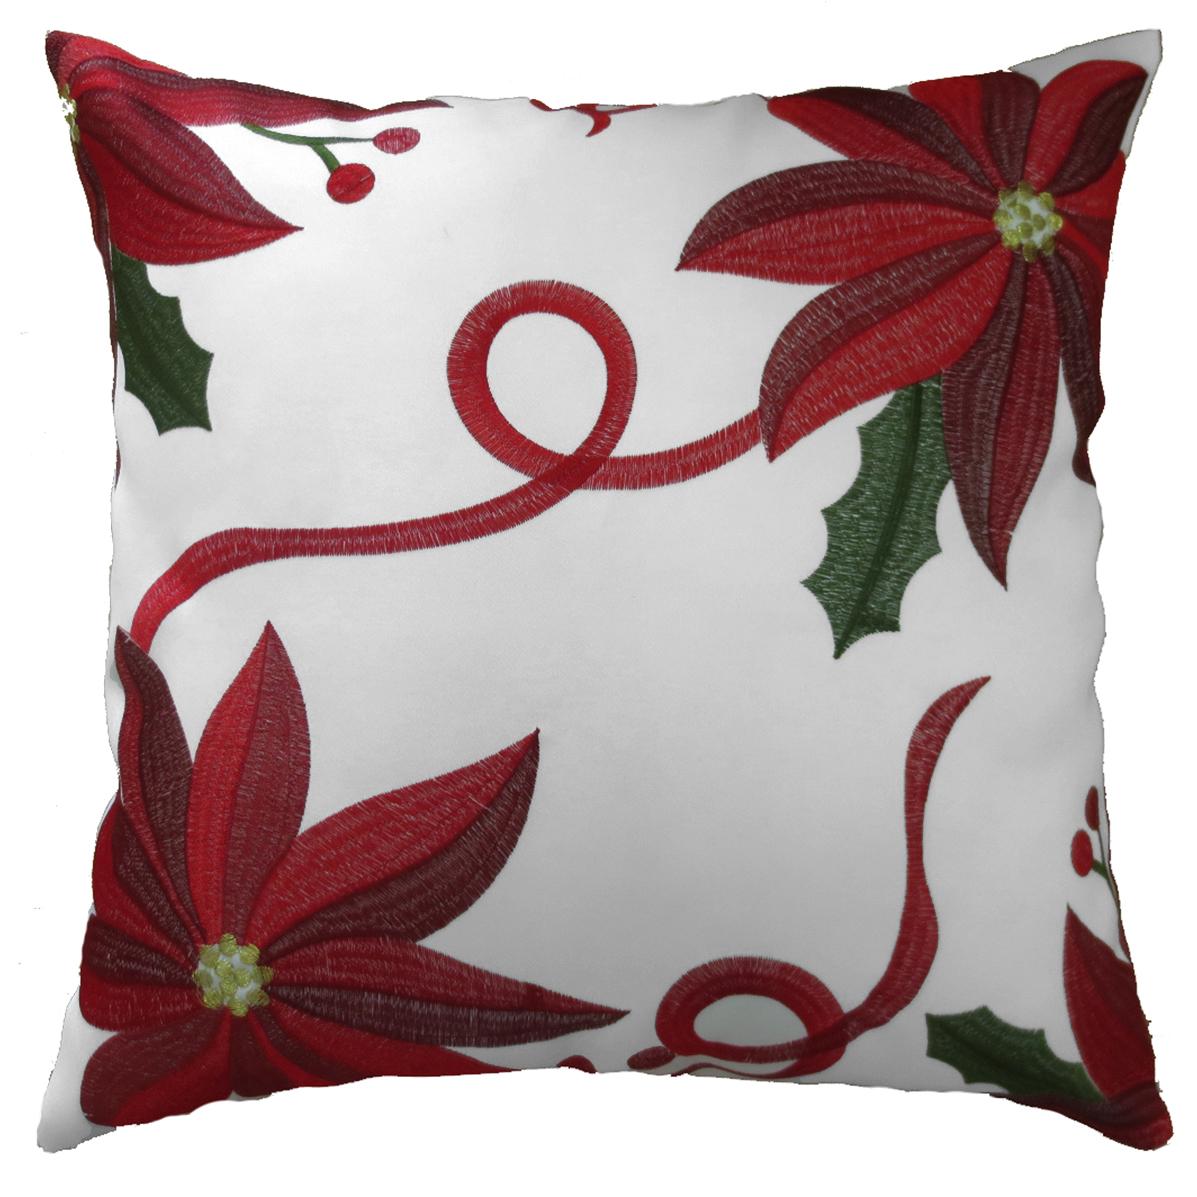 Decorative Christmas Embroidered Poinsettias Design Throw ...